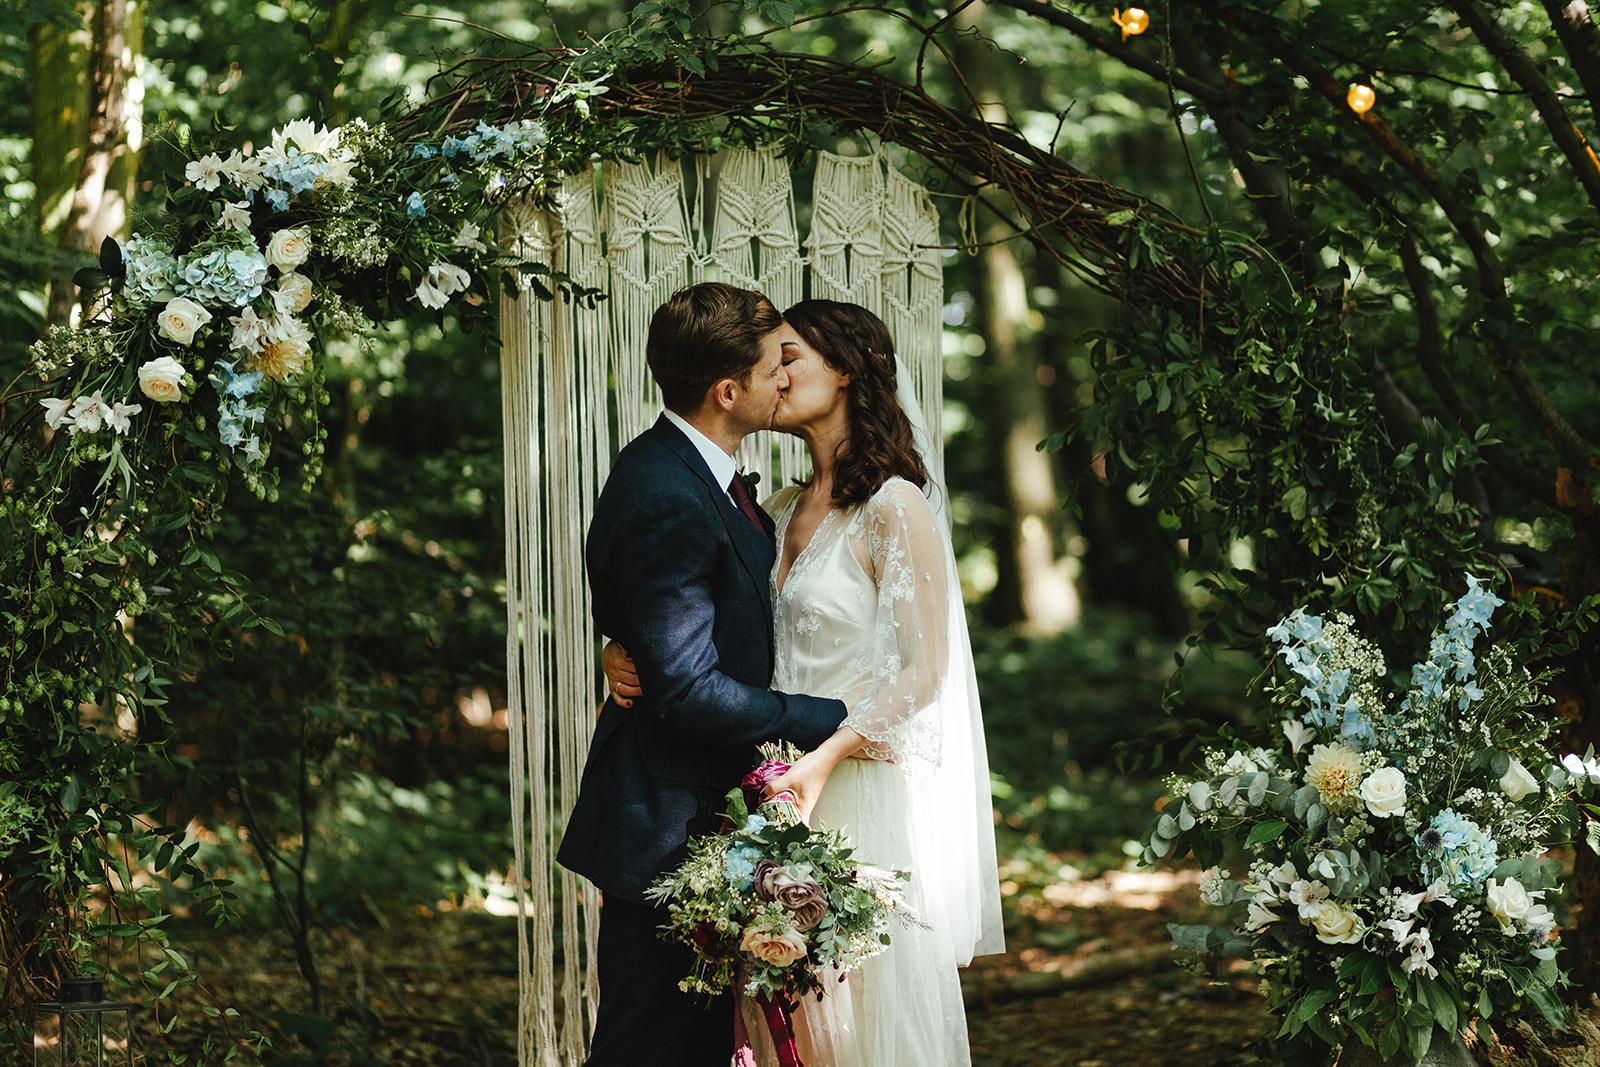 A bride and groom kiss at The Dreys woodland wedding venue